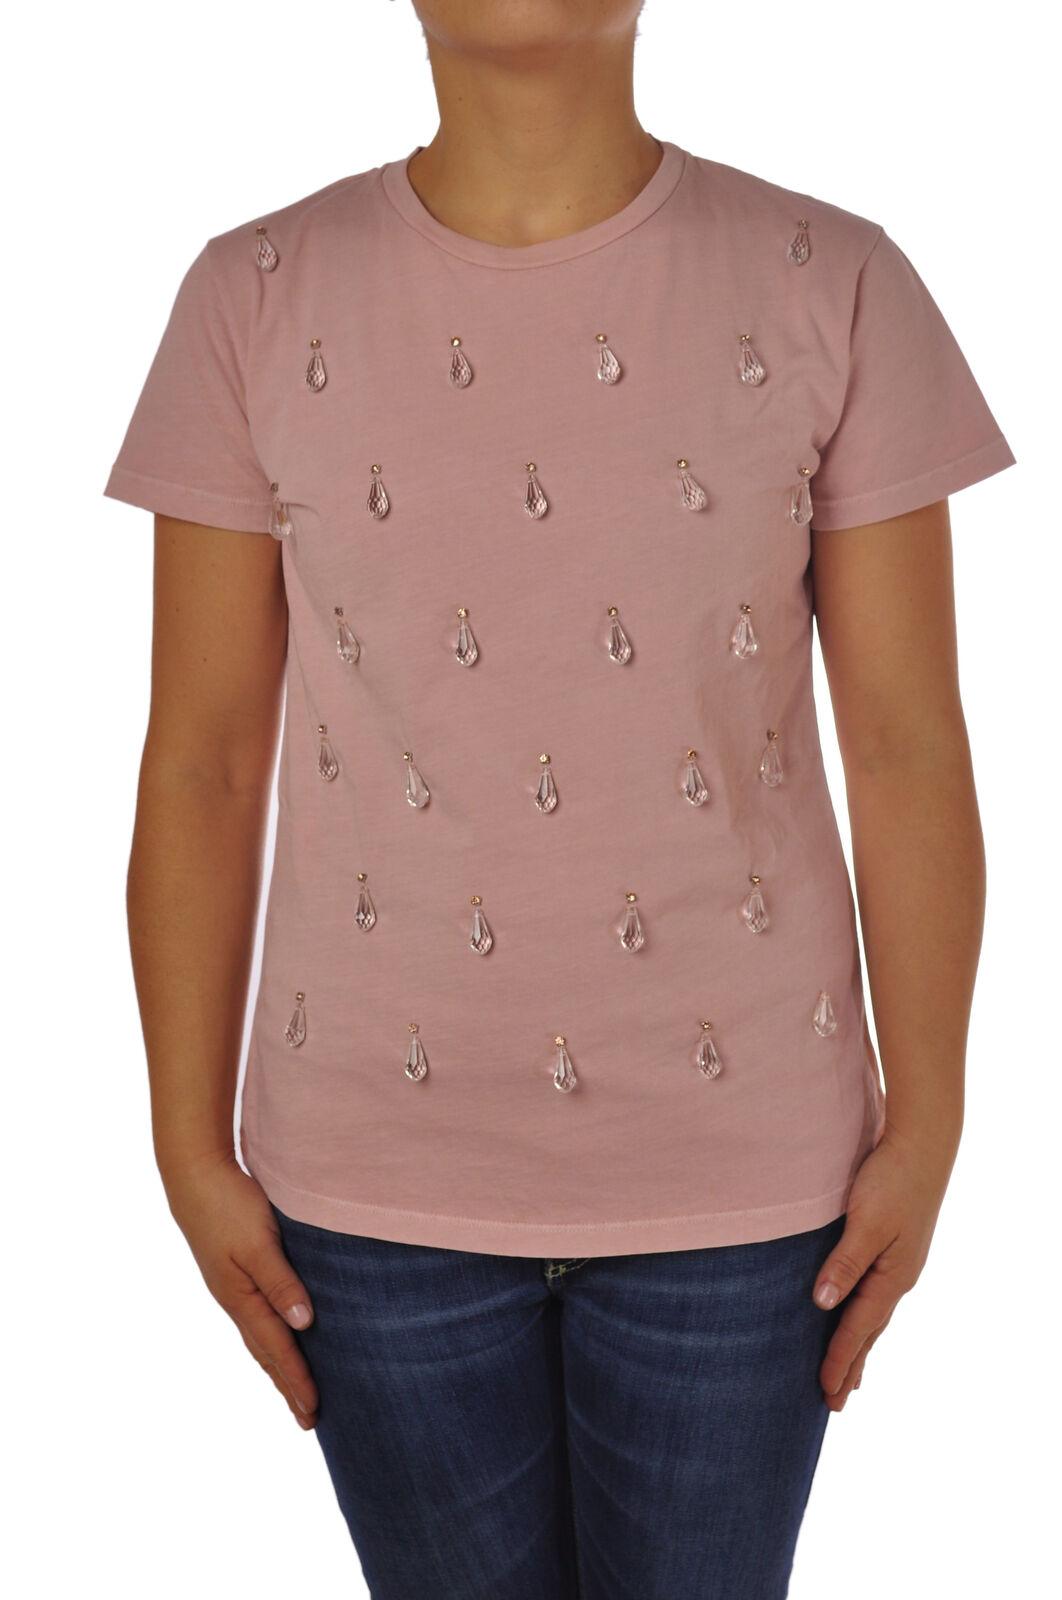 Rosao - Topwear-T-shirts - Frau - Rosa - 4762010H184810